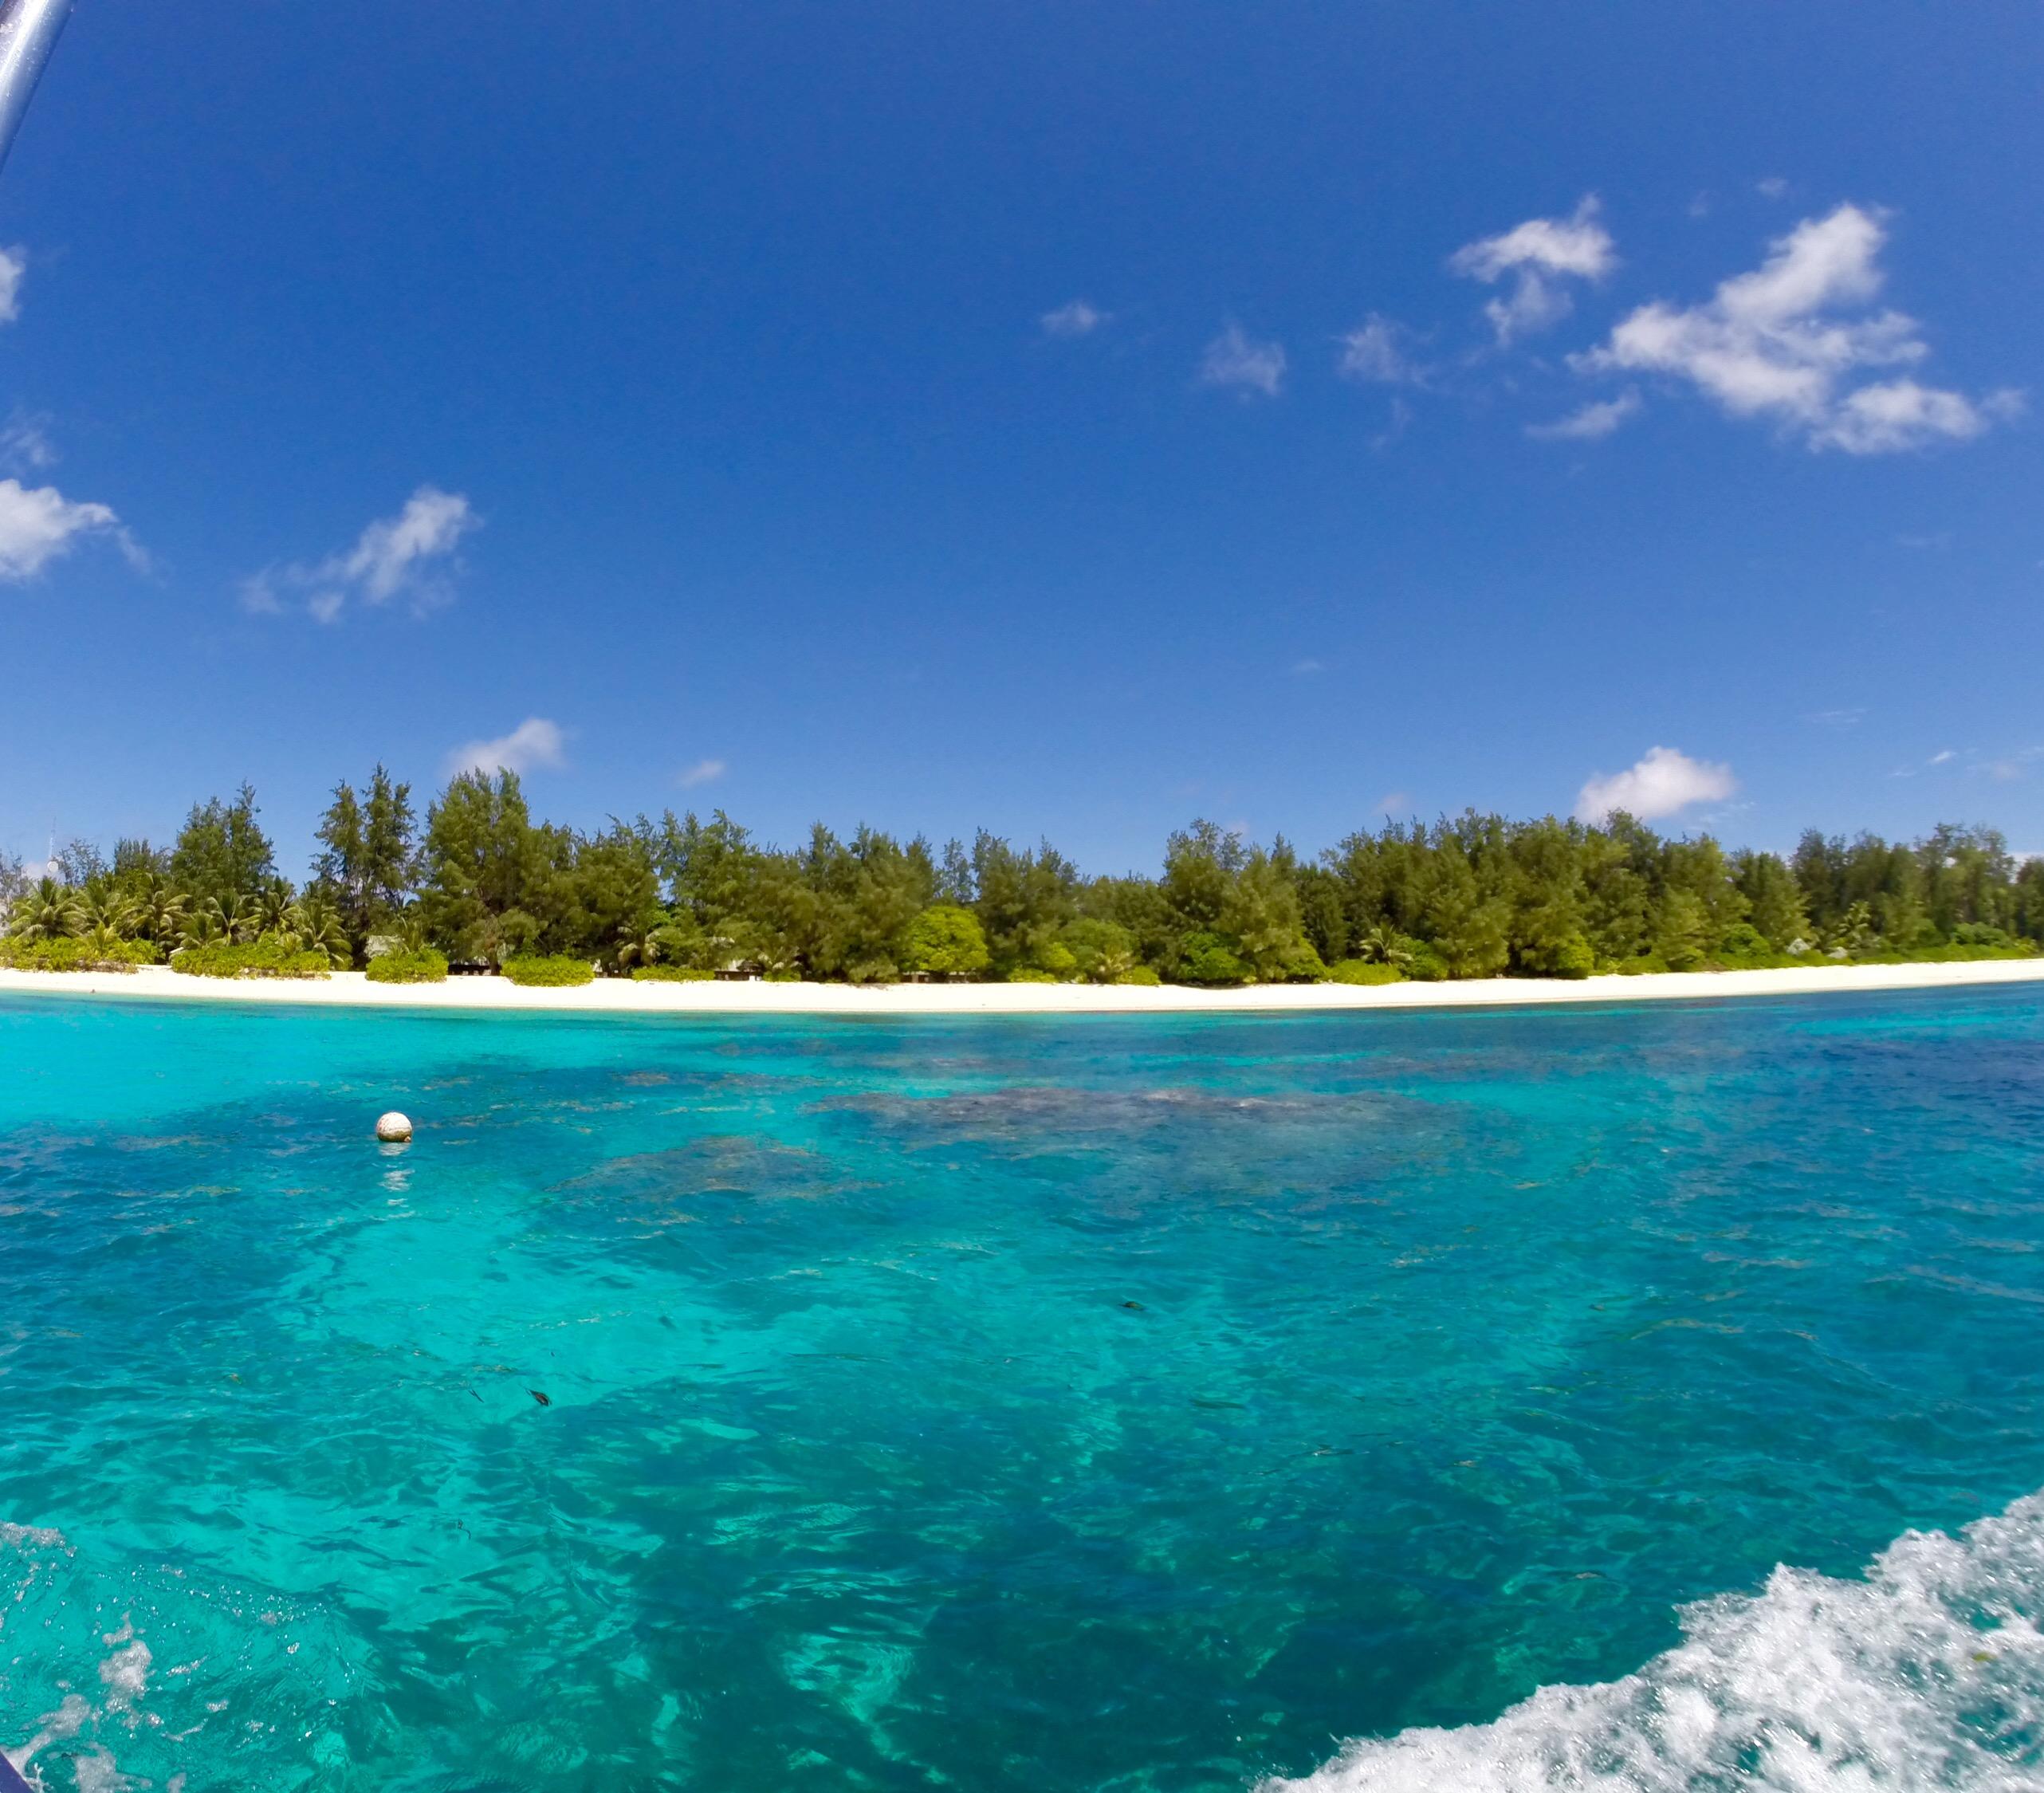 Seychelles Island Beaches: Snorkeling Denis Island, Seychelles